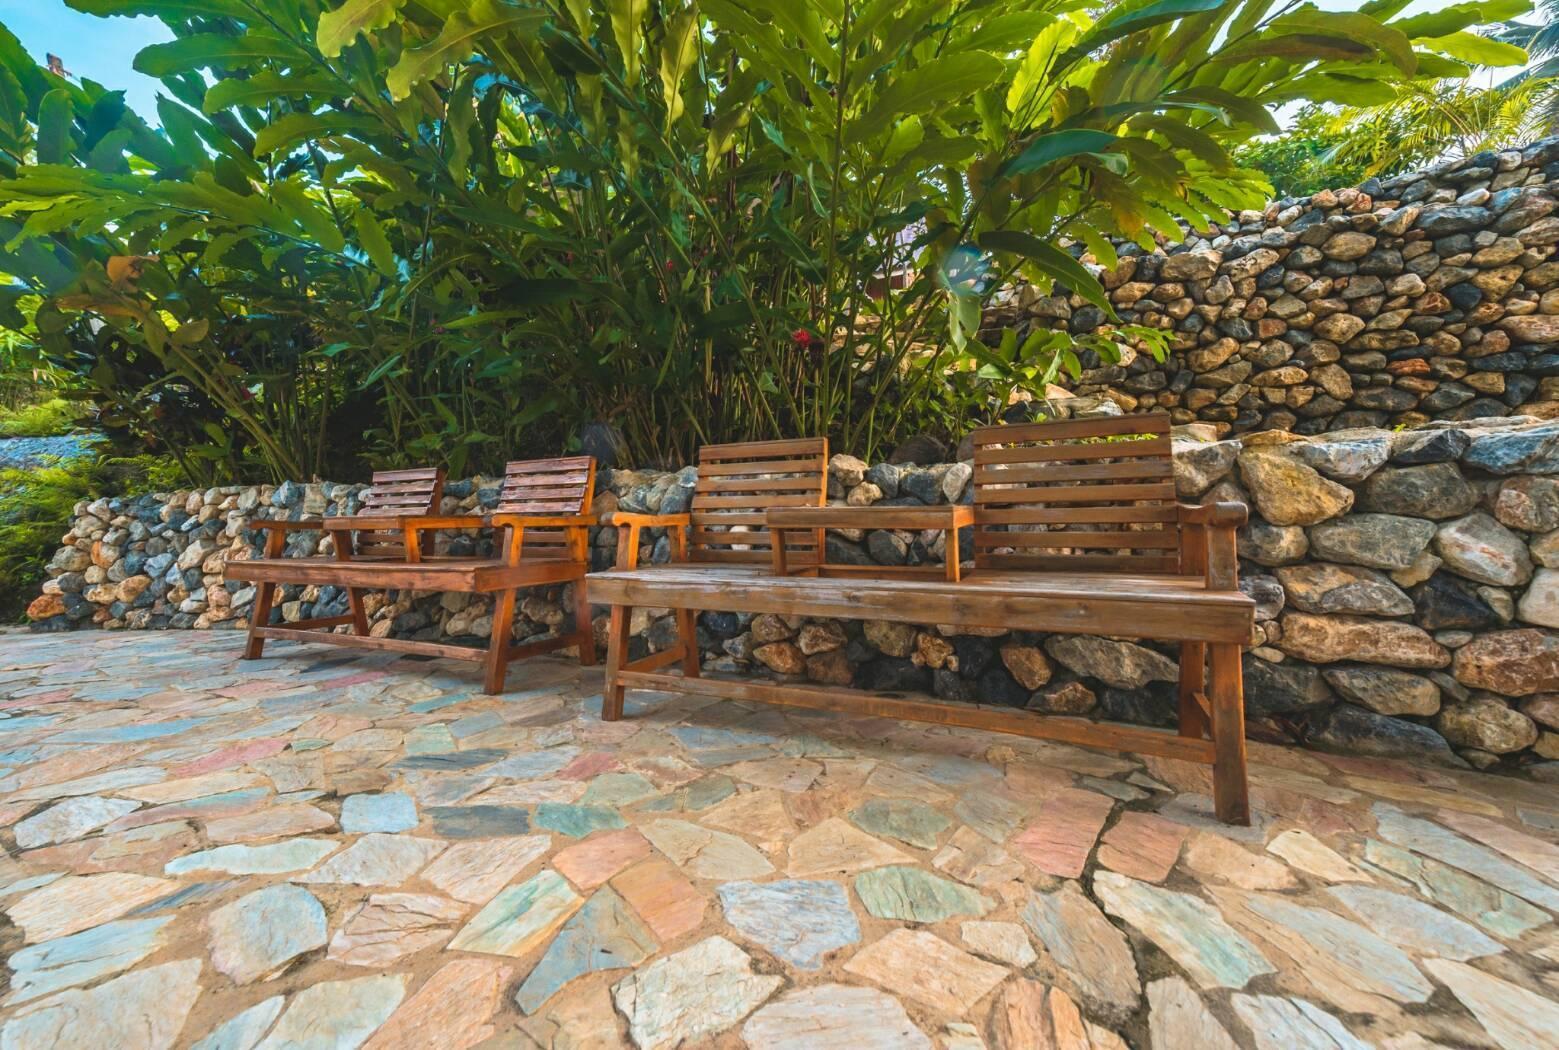 In my dream Resort อิน มาย ดรีม รีสอร์ต